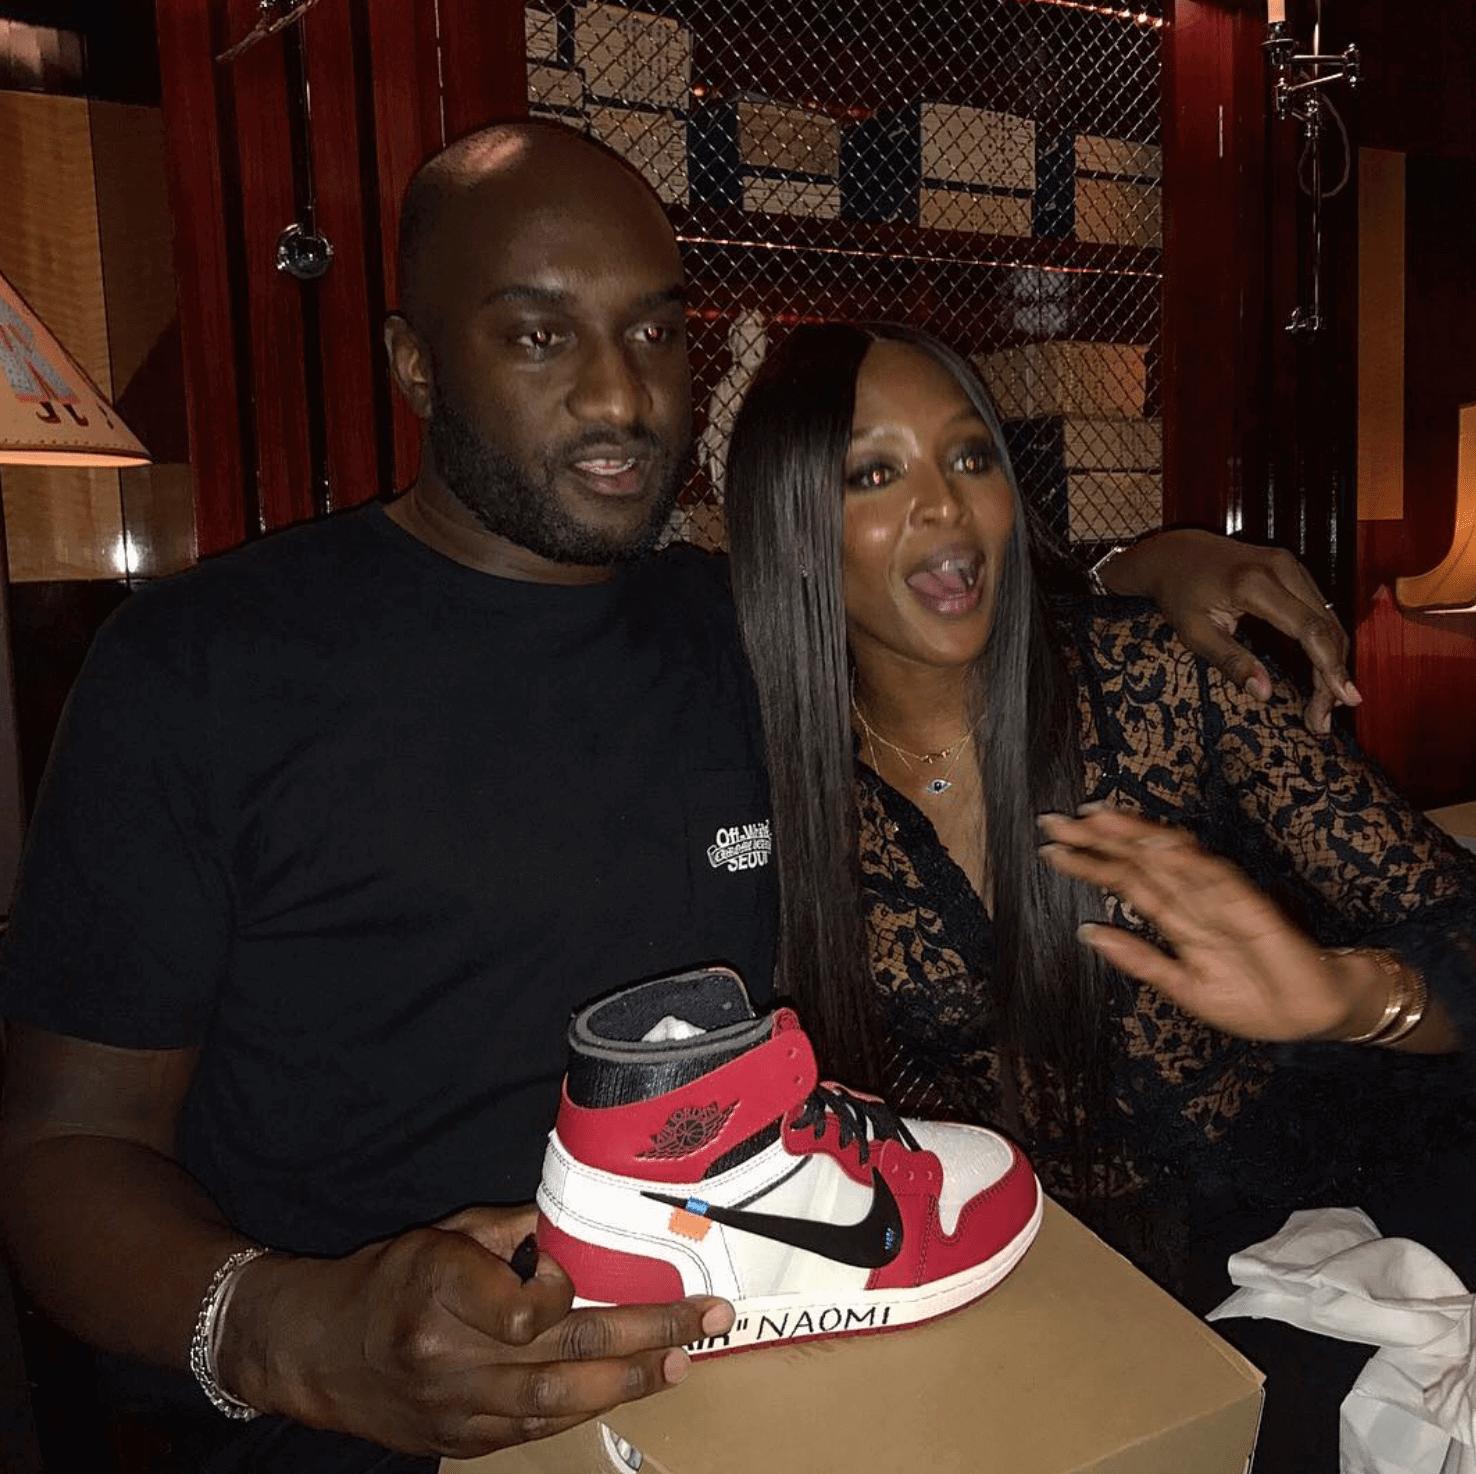 Virgil Abloh & Naomi Campbell with the The 10 Air Jordan 1